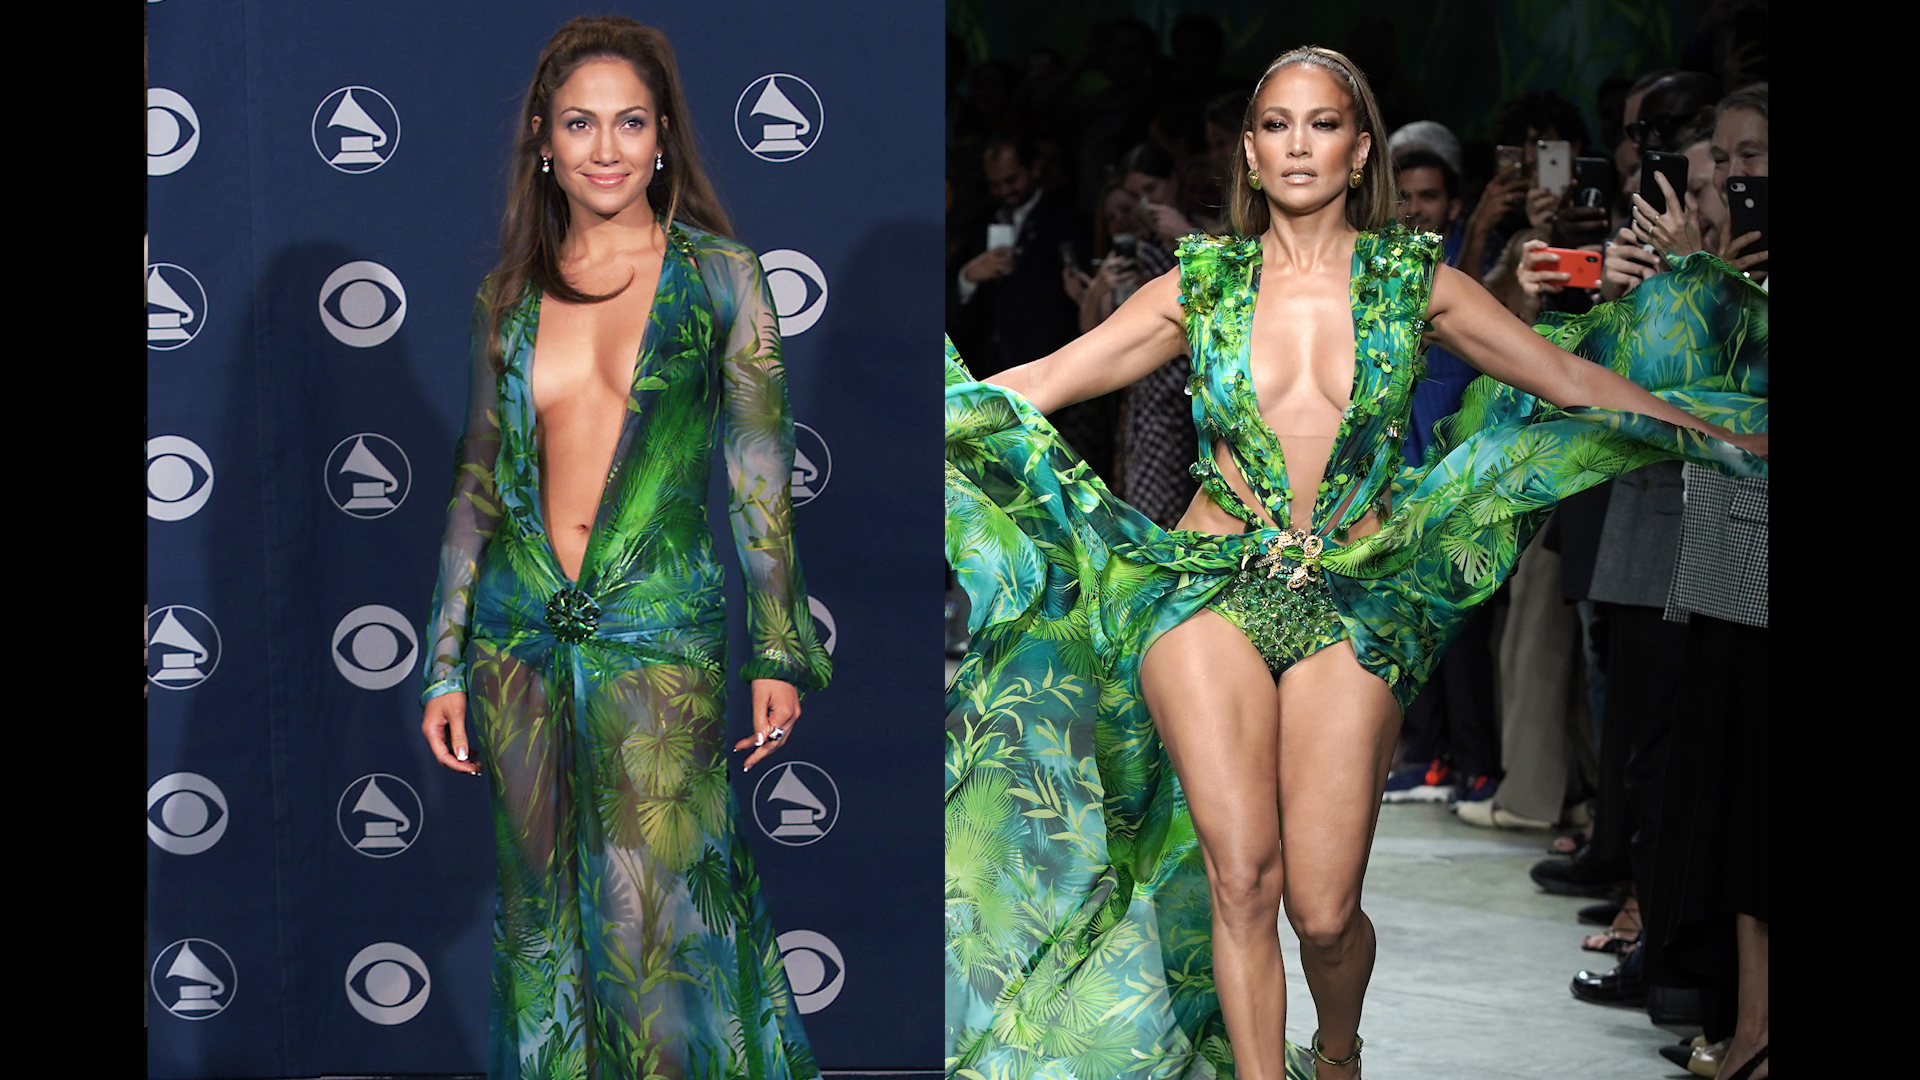 J Lo Shuts Down Fashion Week In Iconic Green Dress Cnn Video